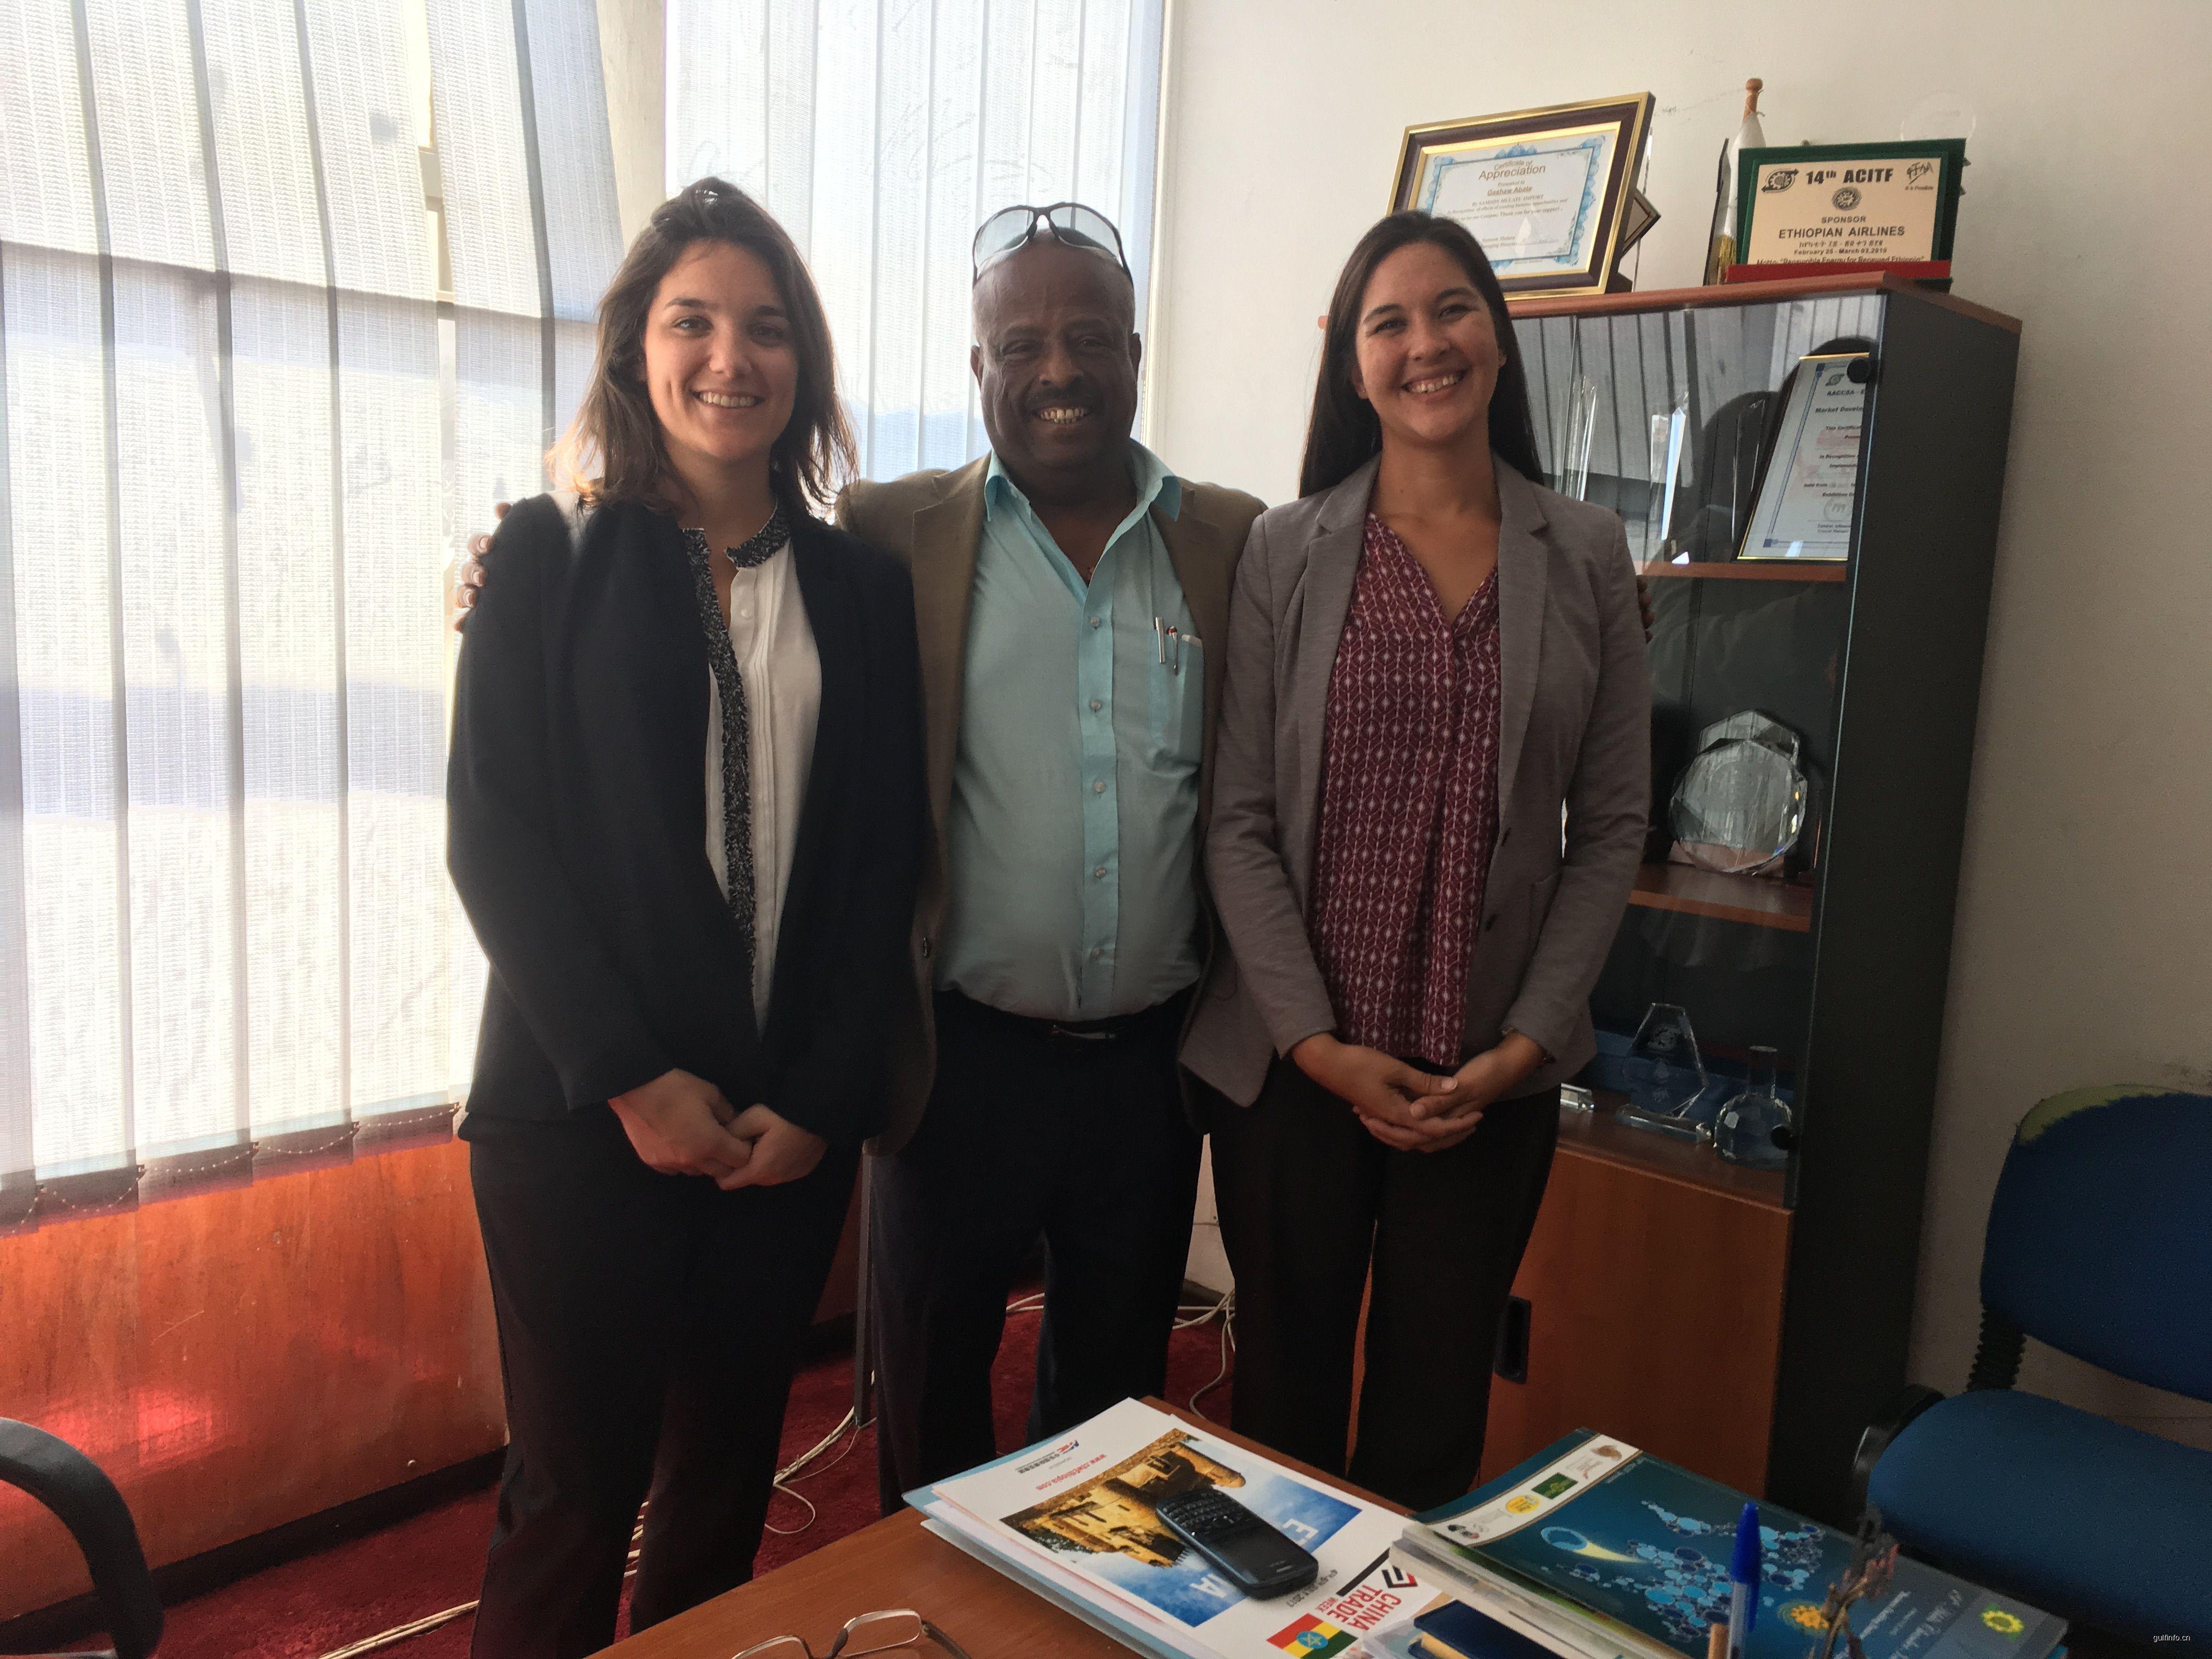 MIE集团与埃塞贸易与投资商<font color=#ff0000>会</font>达成合作共识,重点支持埃塞俄比亚中国贸易周!